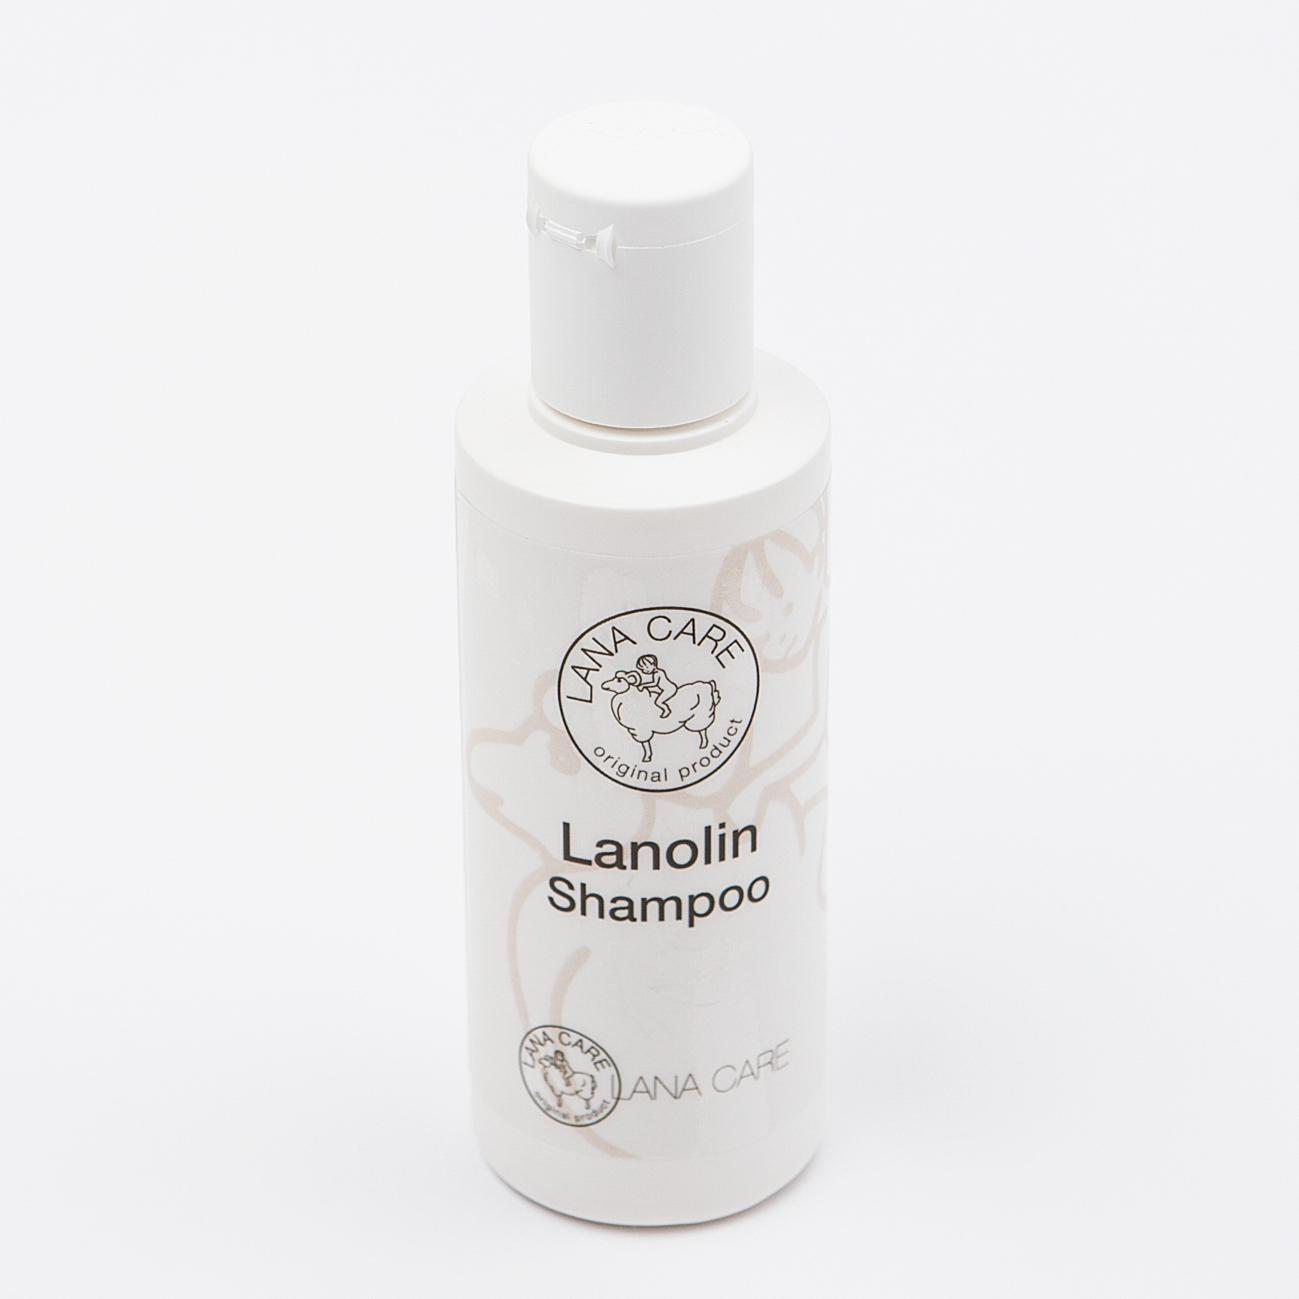 Lanolin shampoo